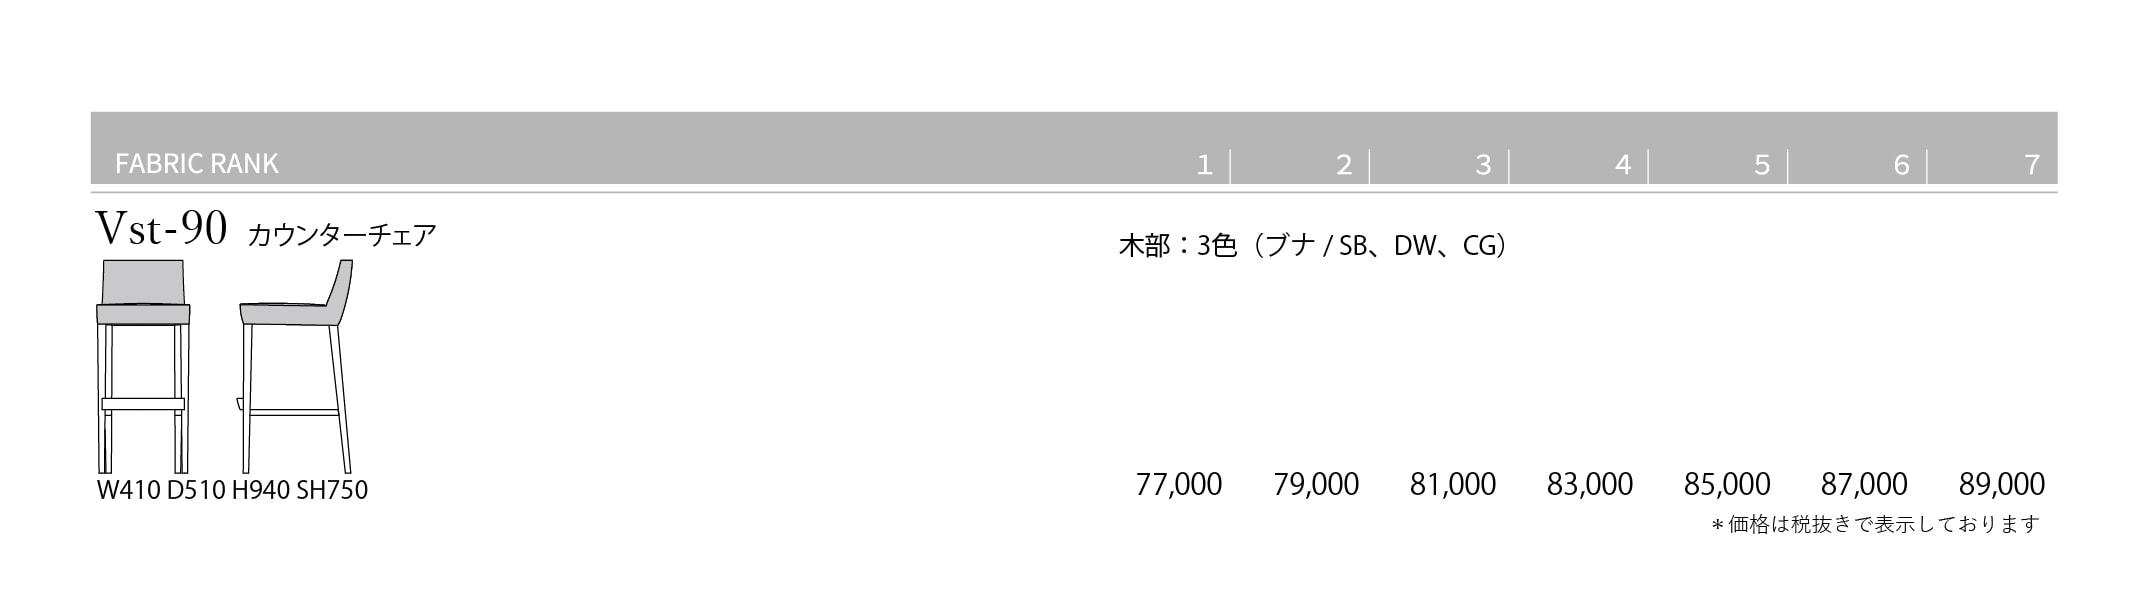 Vst-90 Price List